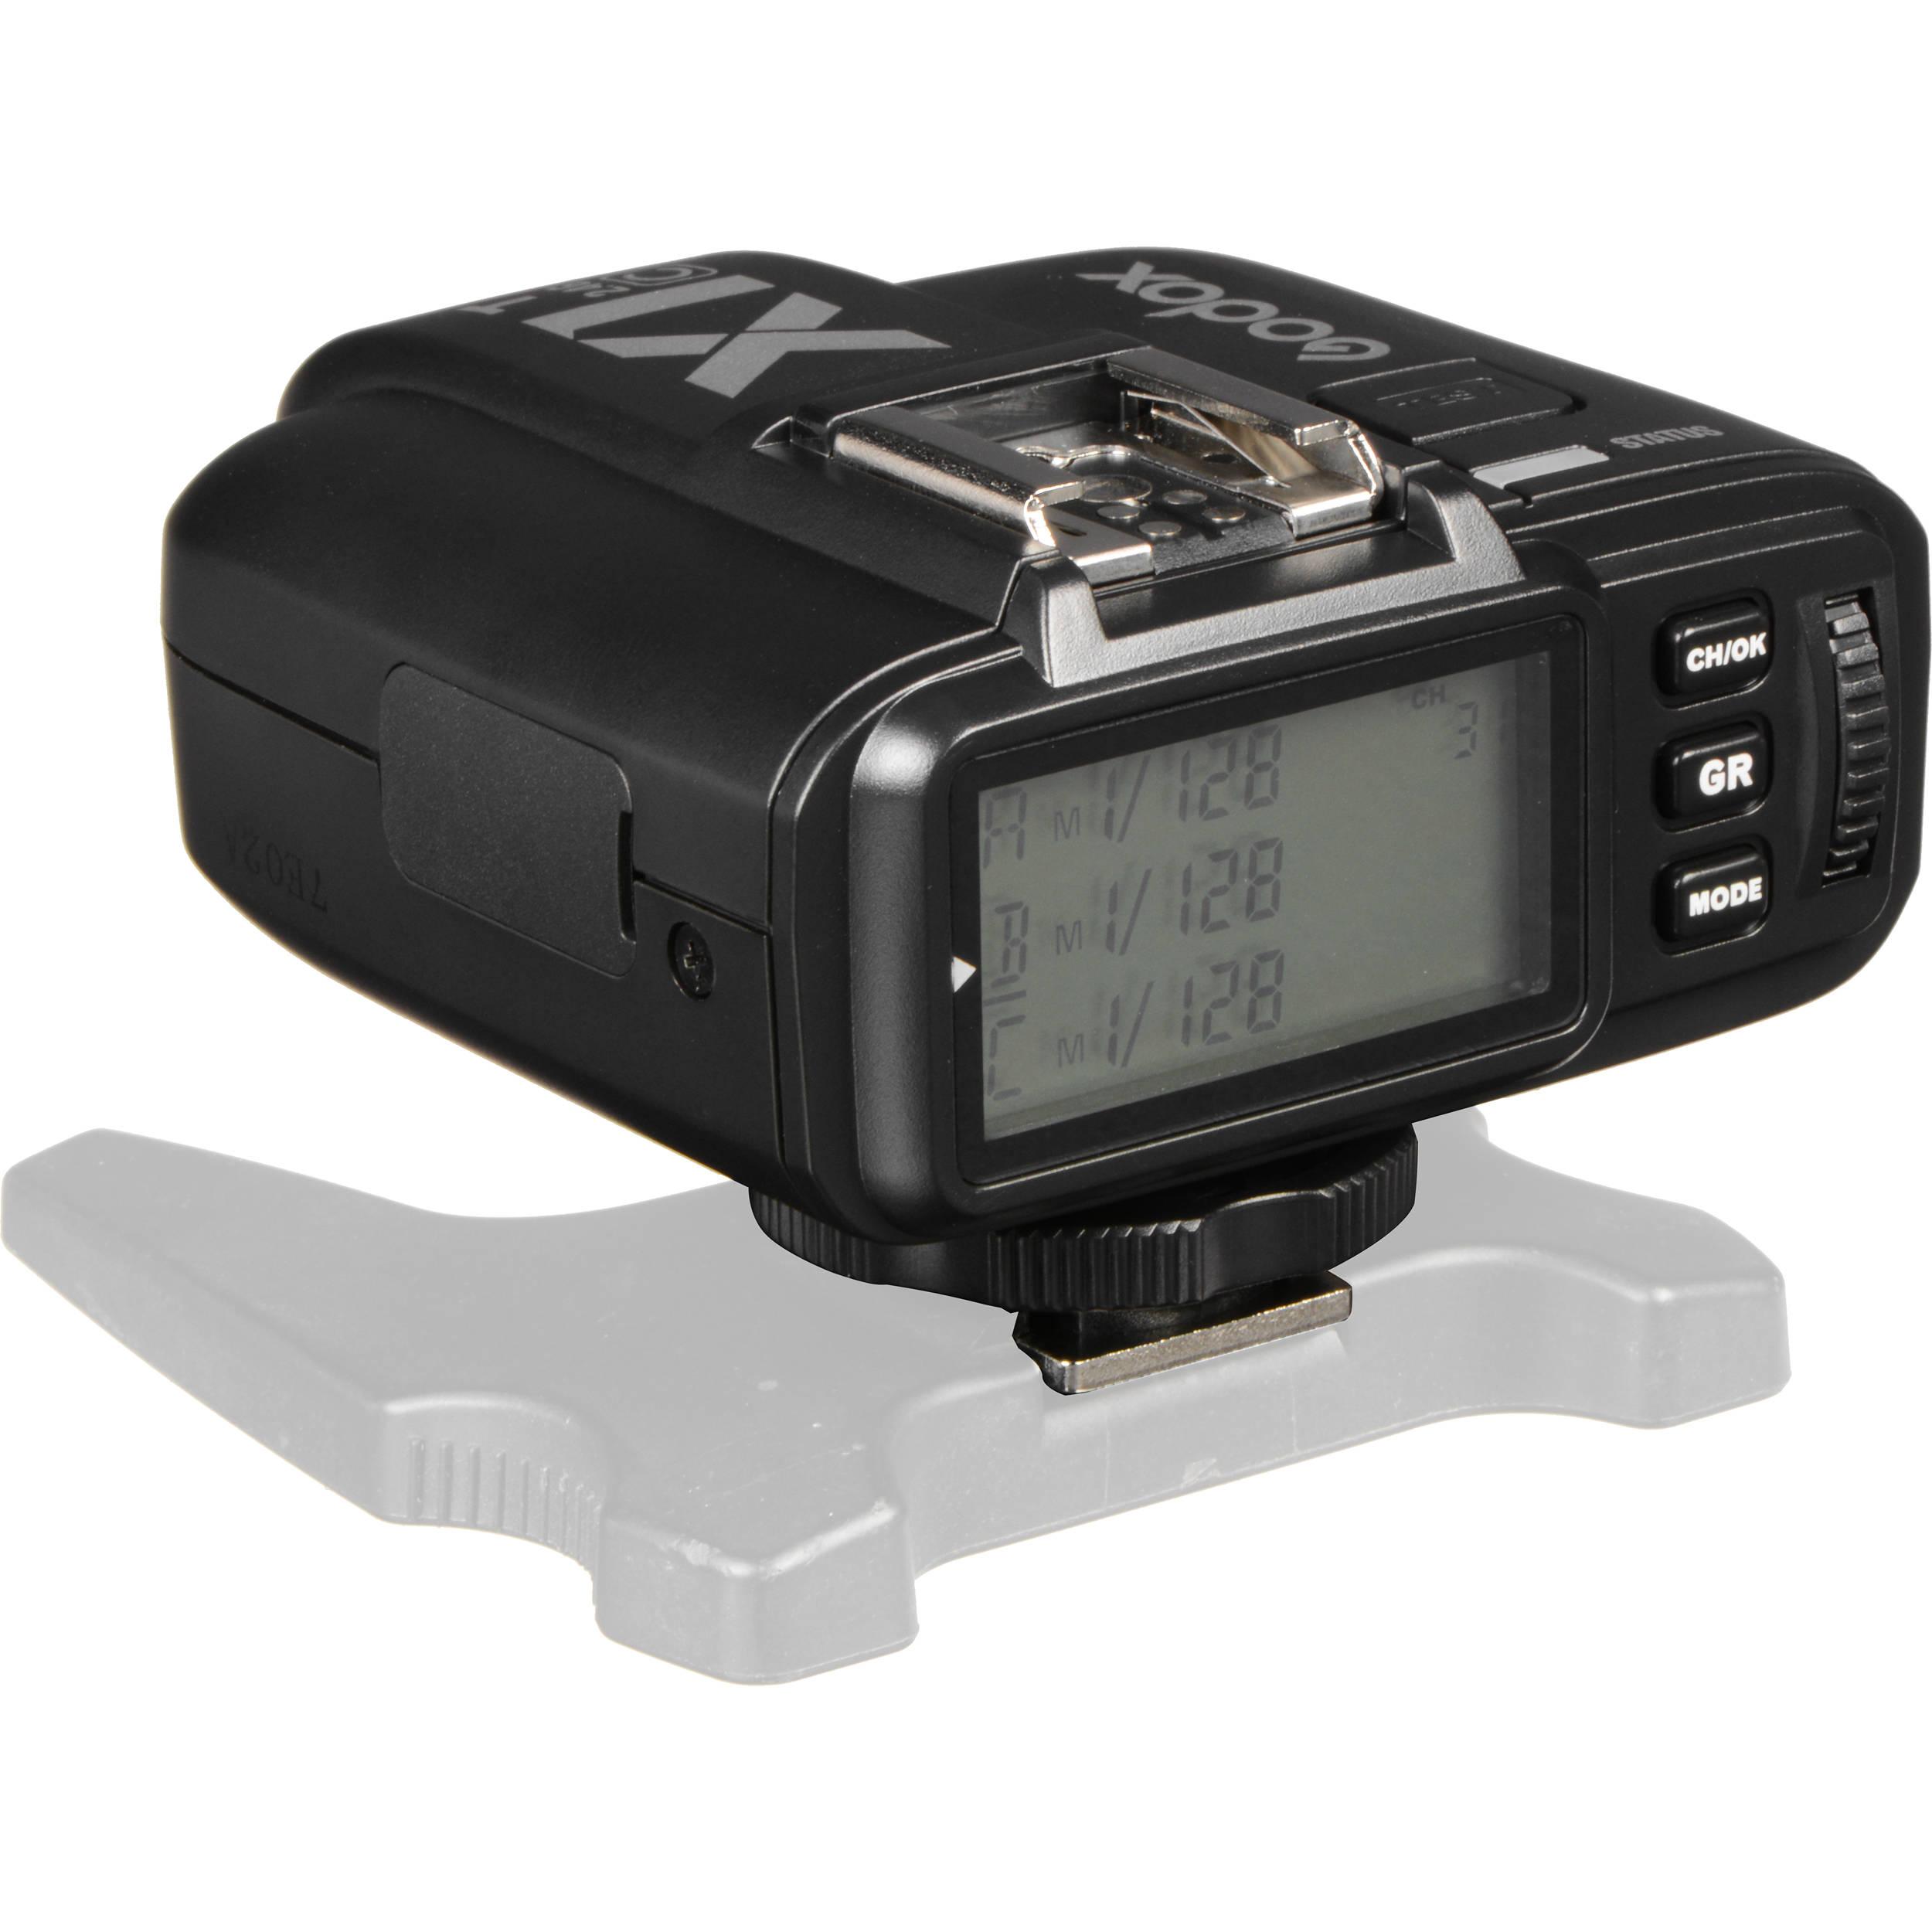 Godox X1T-C TTL Wireless Flash Trigger Transmitter for Canon